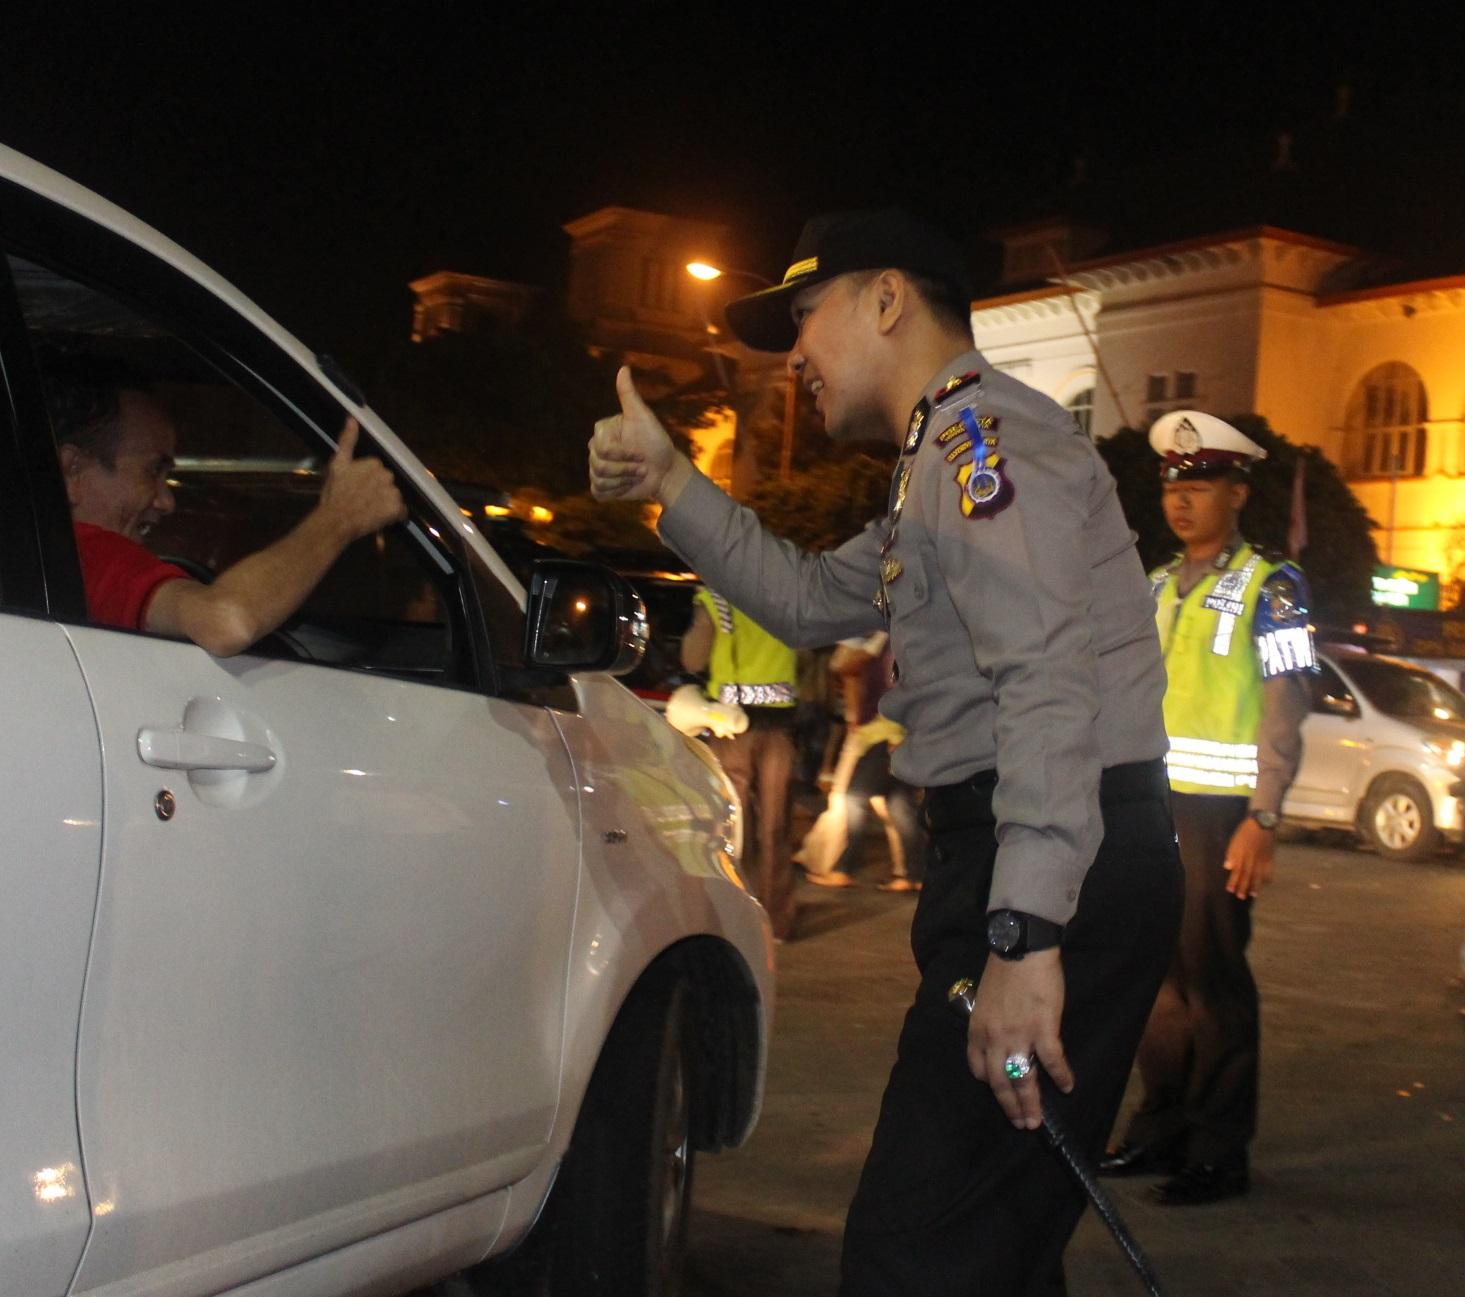 KAPOLRESTA YOGYAKARTA$quote=Kombes Polisi Tommy Wibisono, S.Ik